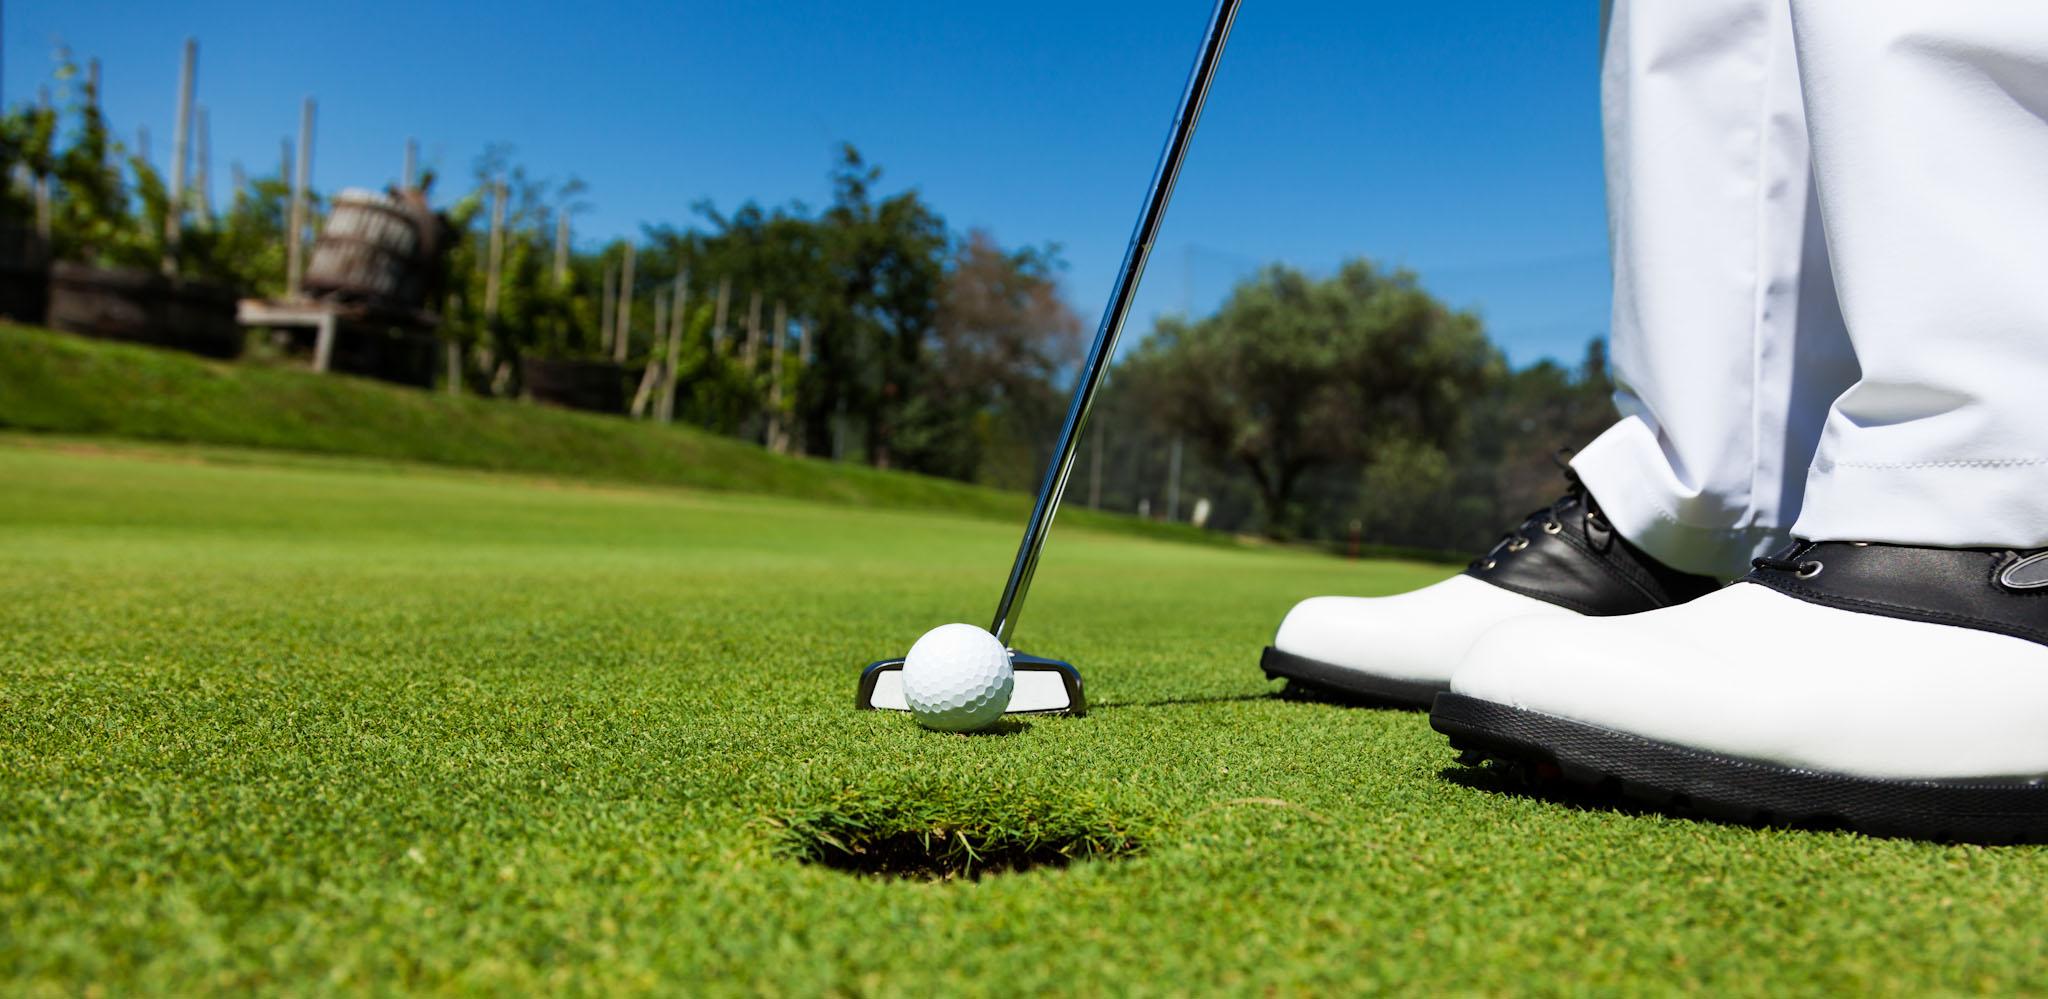 Golf WowPhoto